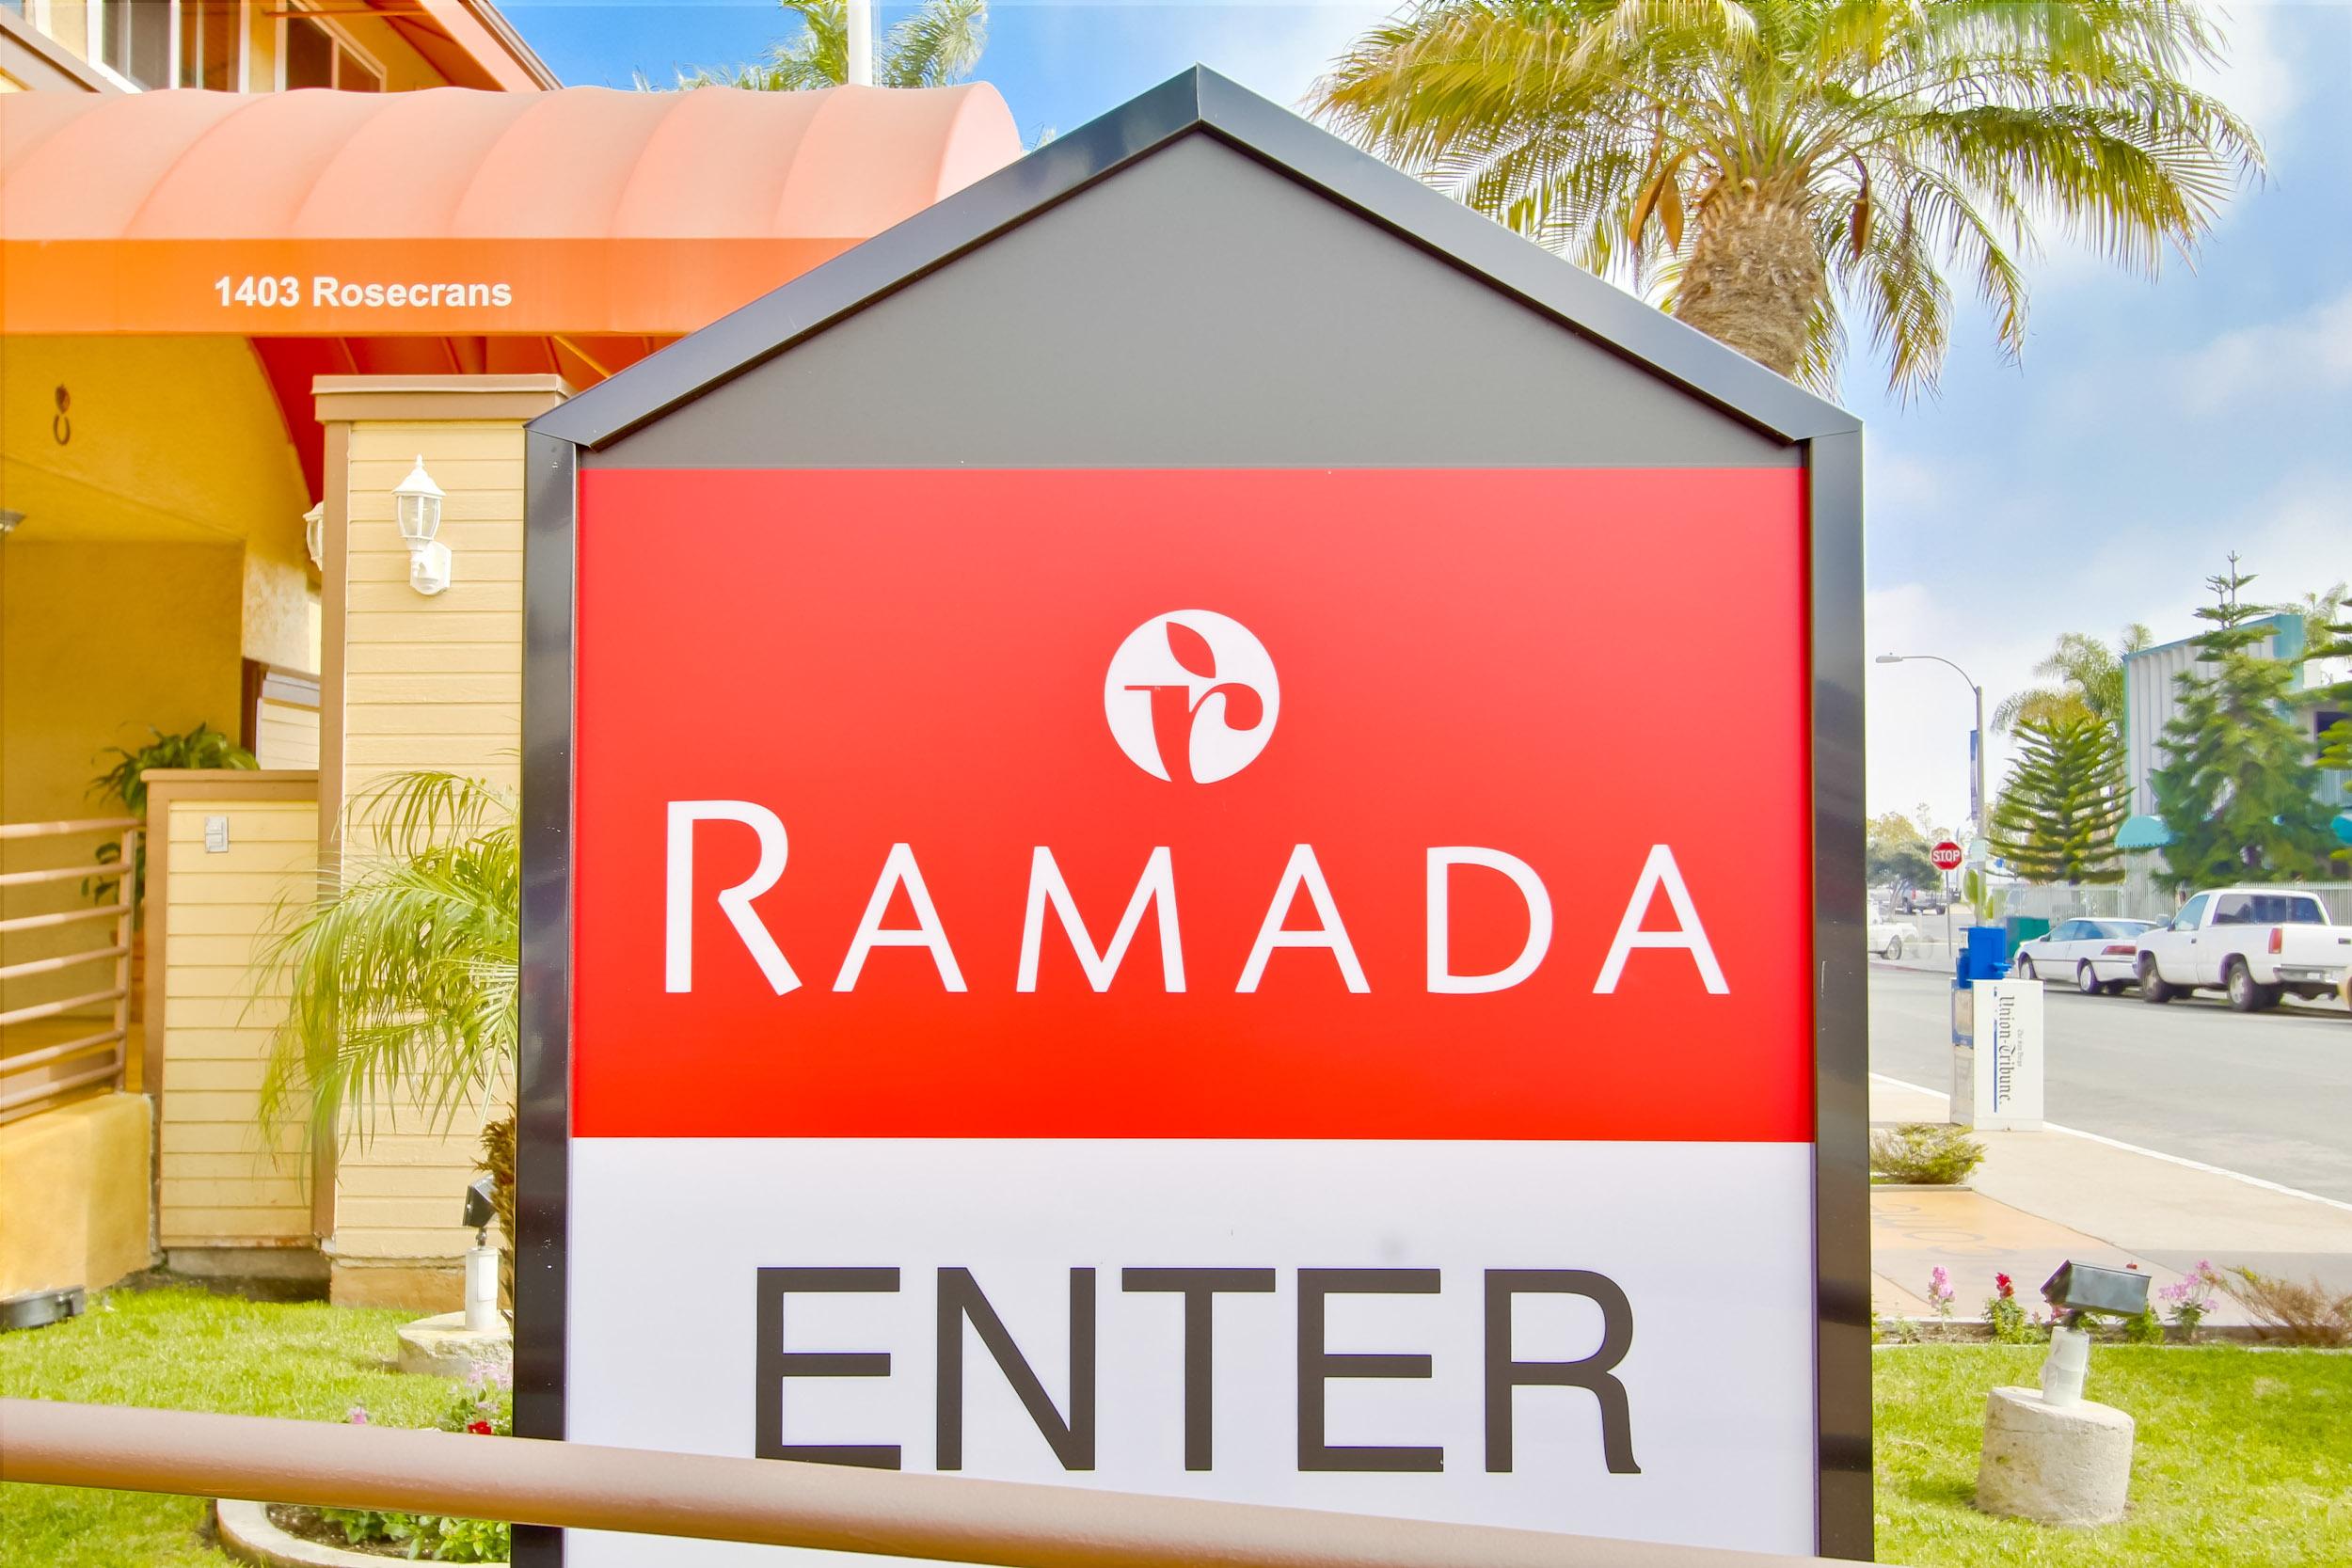 Ramada San Diego Airport - Welcome to the Ramada San Diego Airport